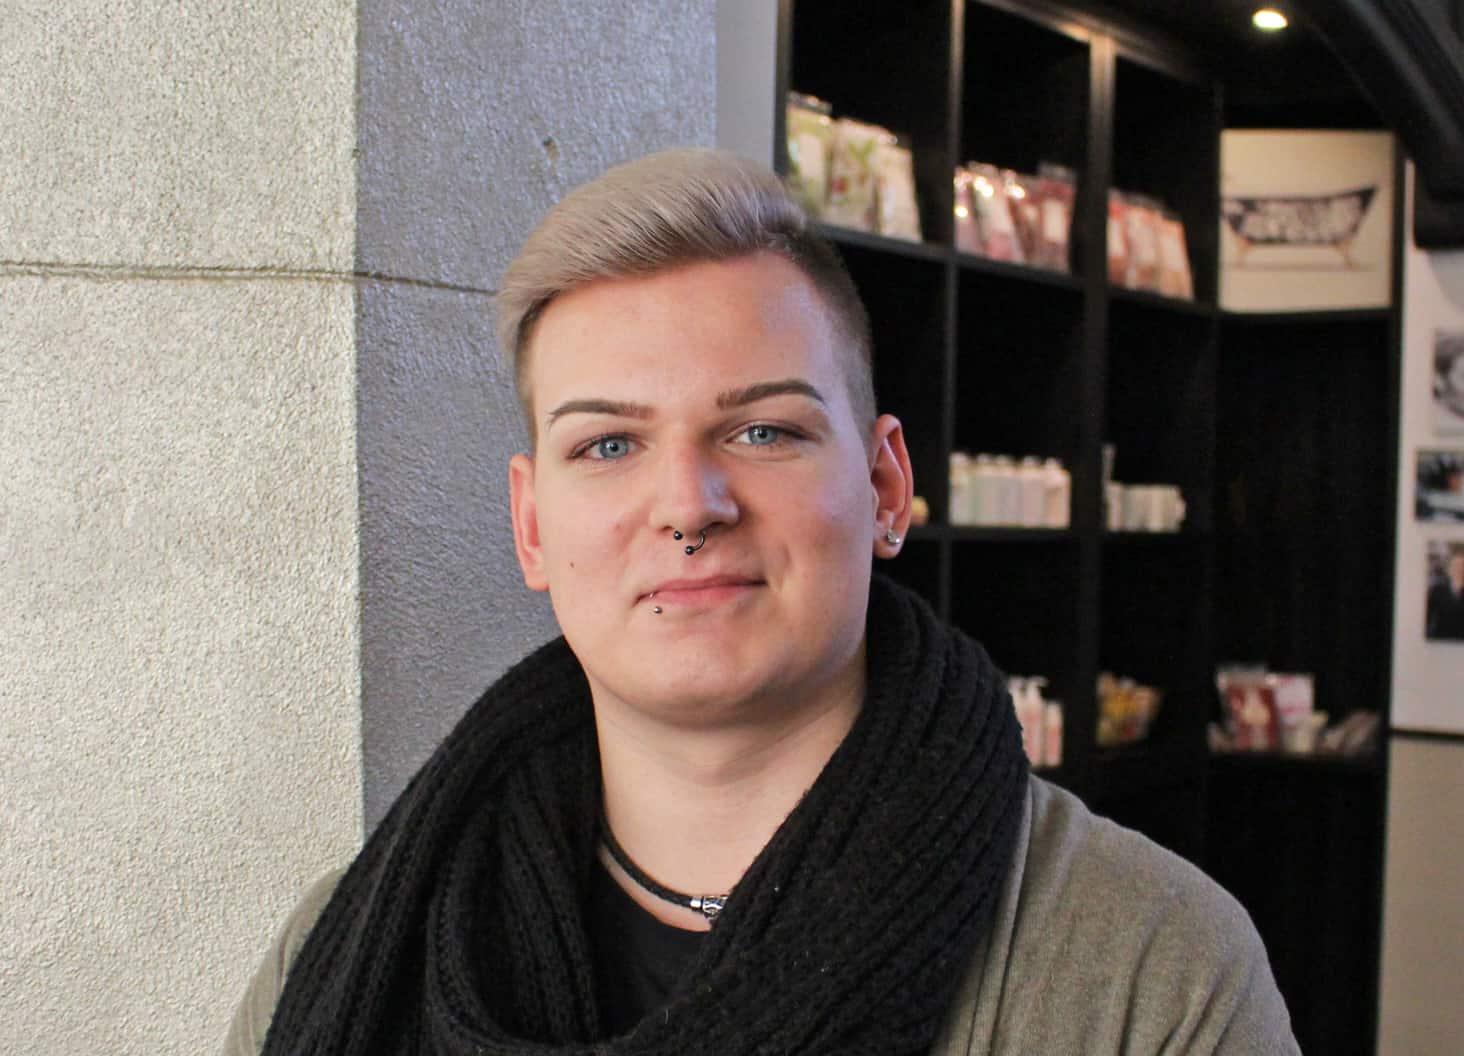 Friseur-Azubi Andrew Wallborn aus Leipzig